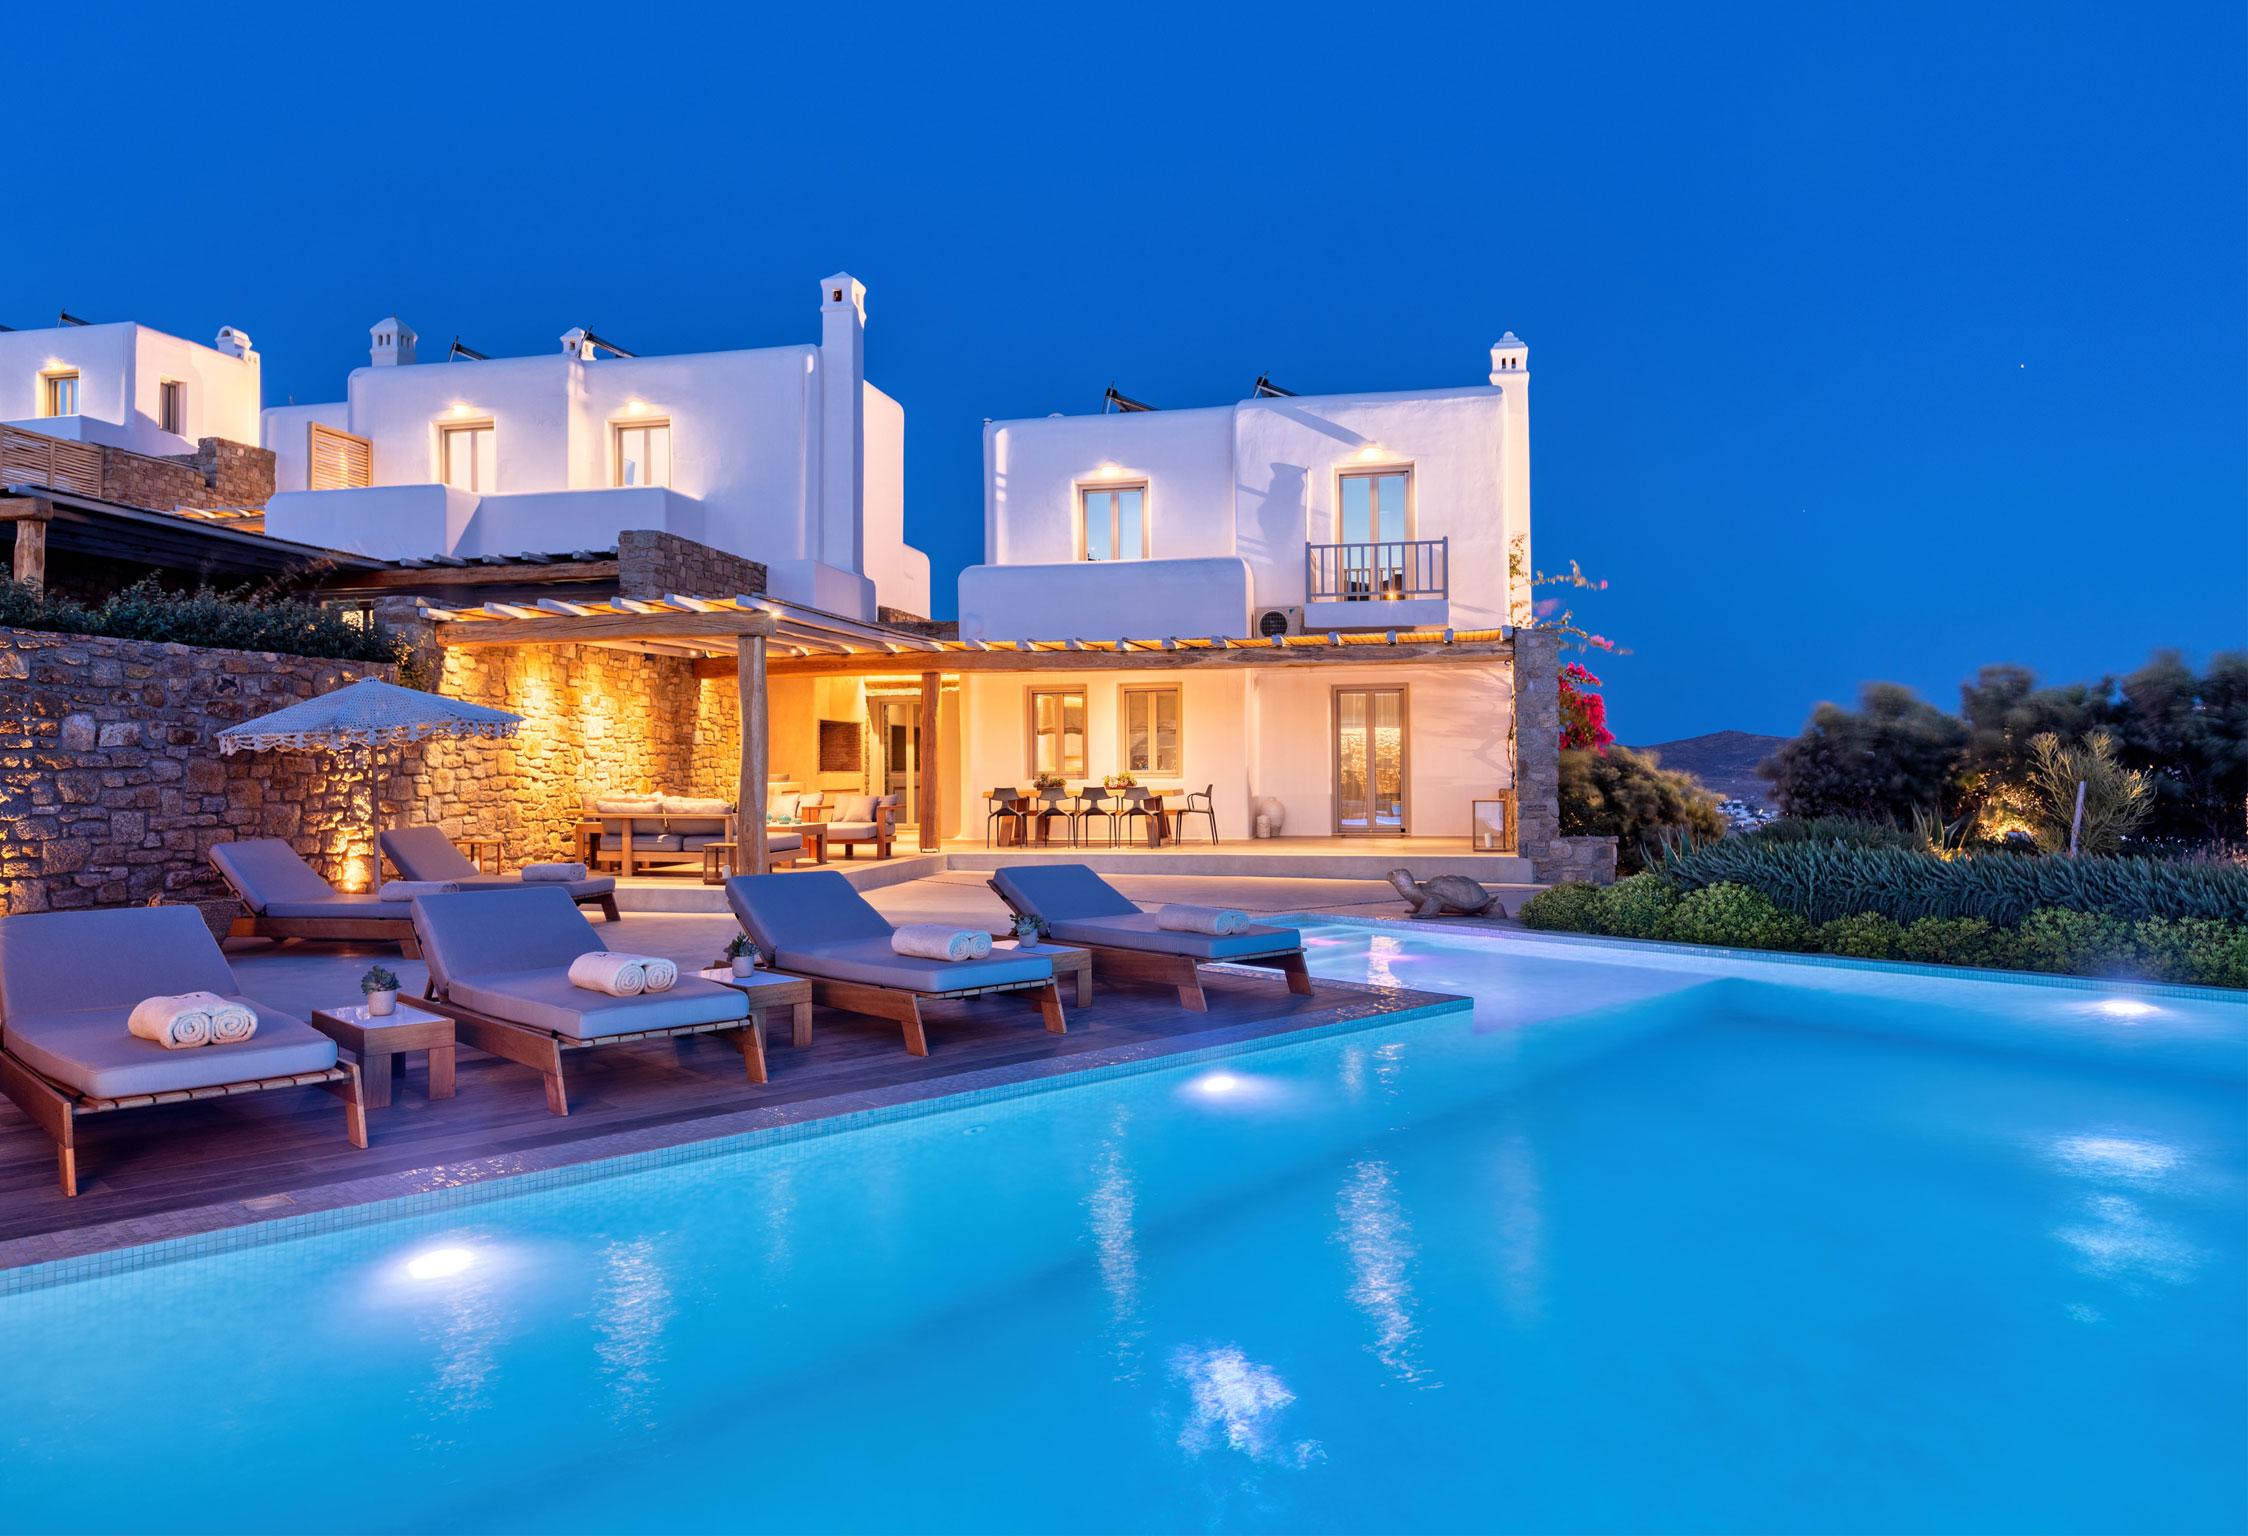 Mykonos Villa Dolon 4 jumbotron image